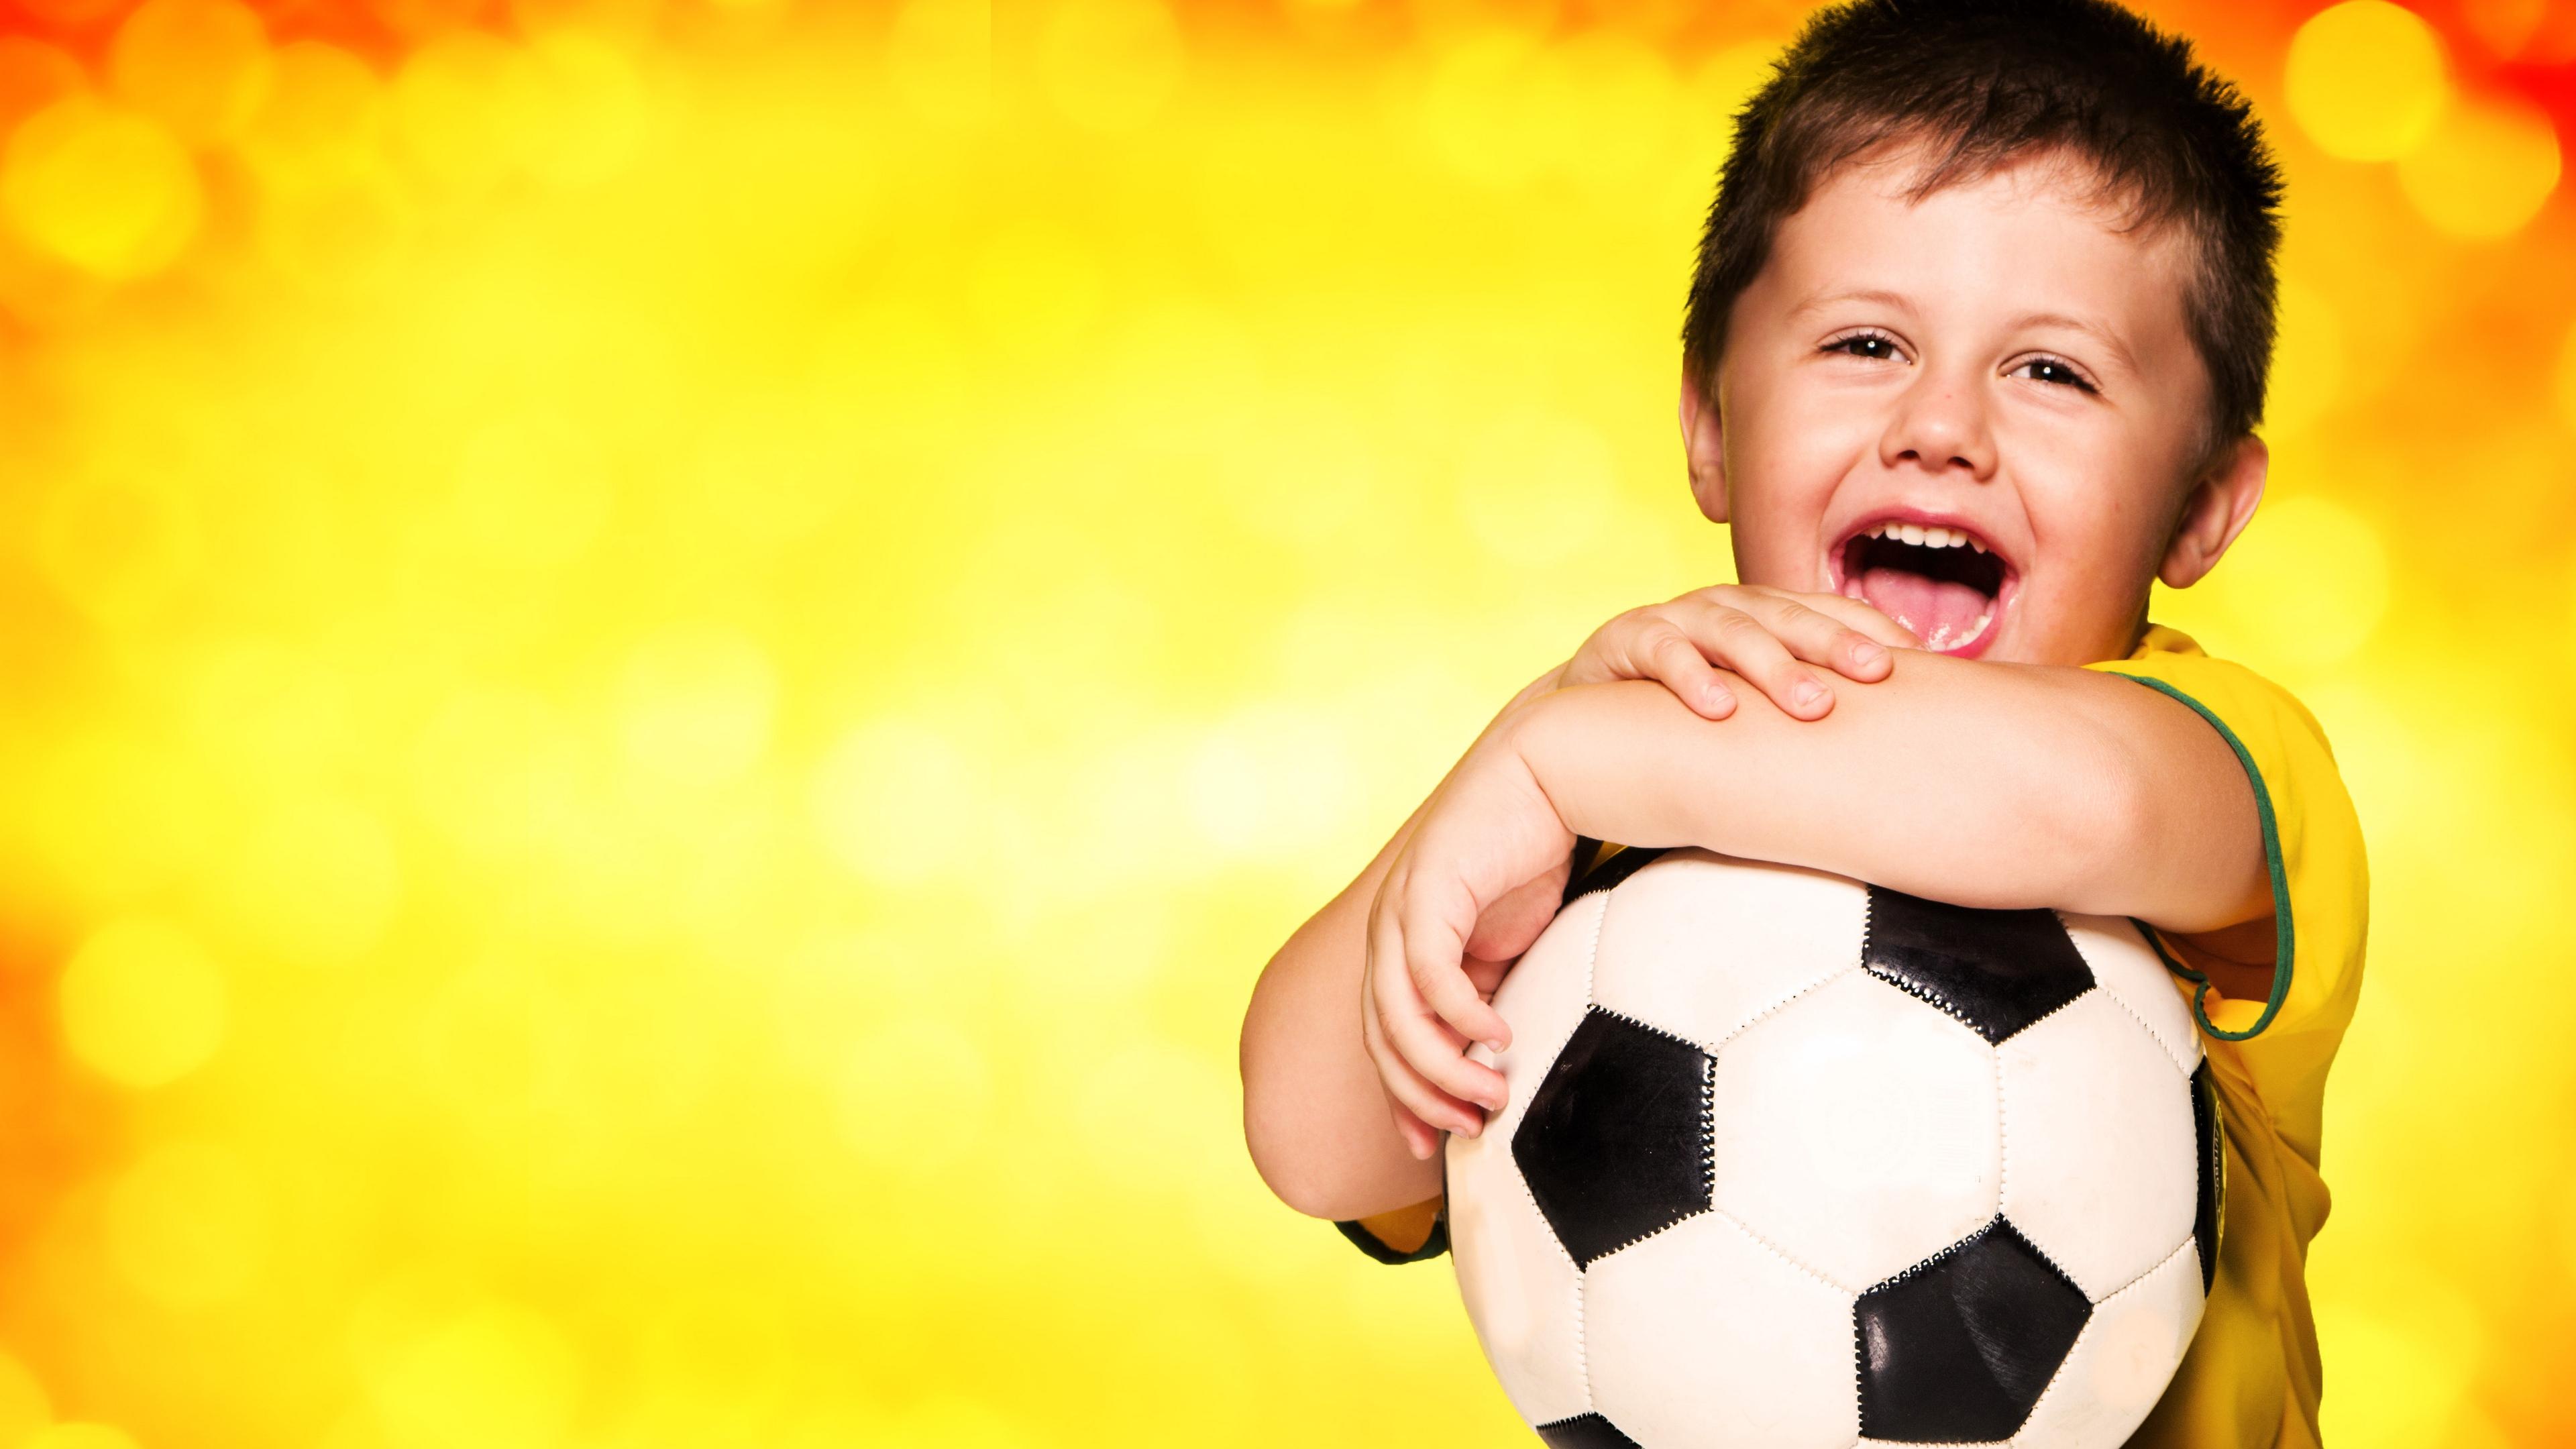 brazil fifa football fan ball 4k 1540062992 - brazil, fifa, football, fan, ball 4k - Football, FIFA, Brazil